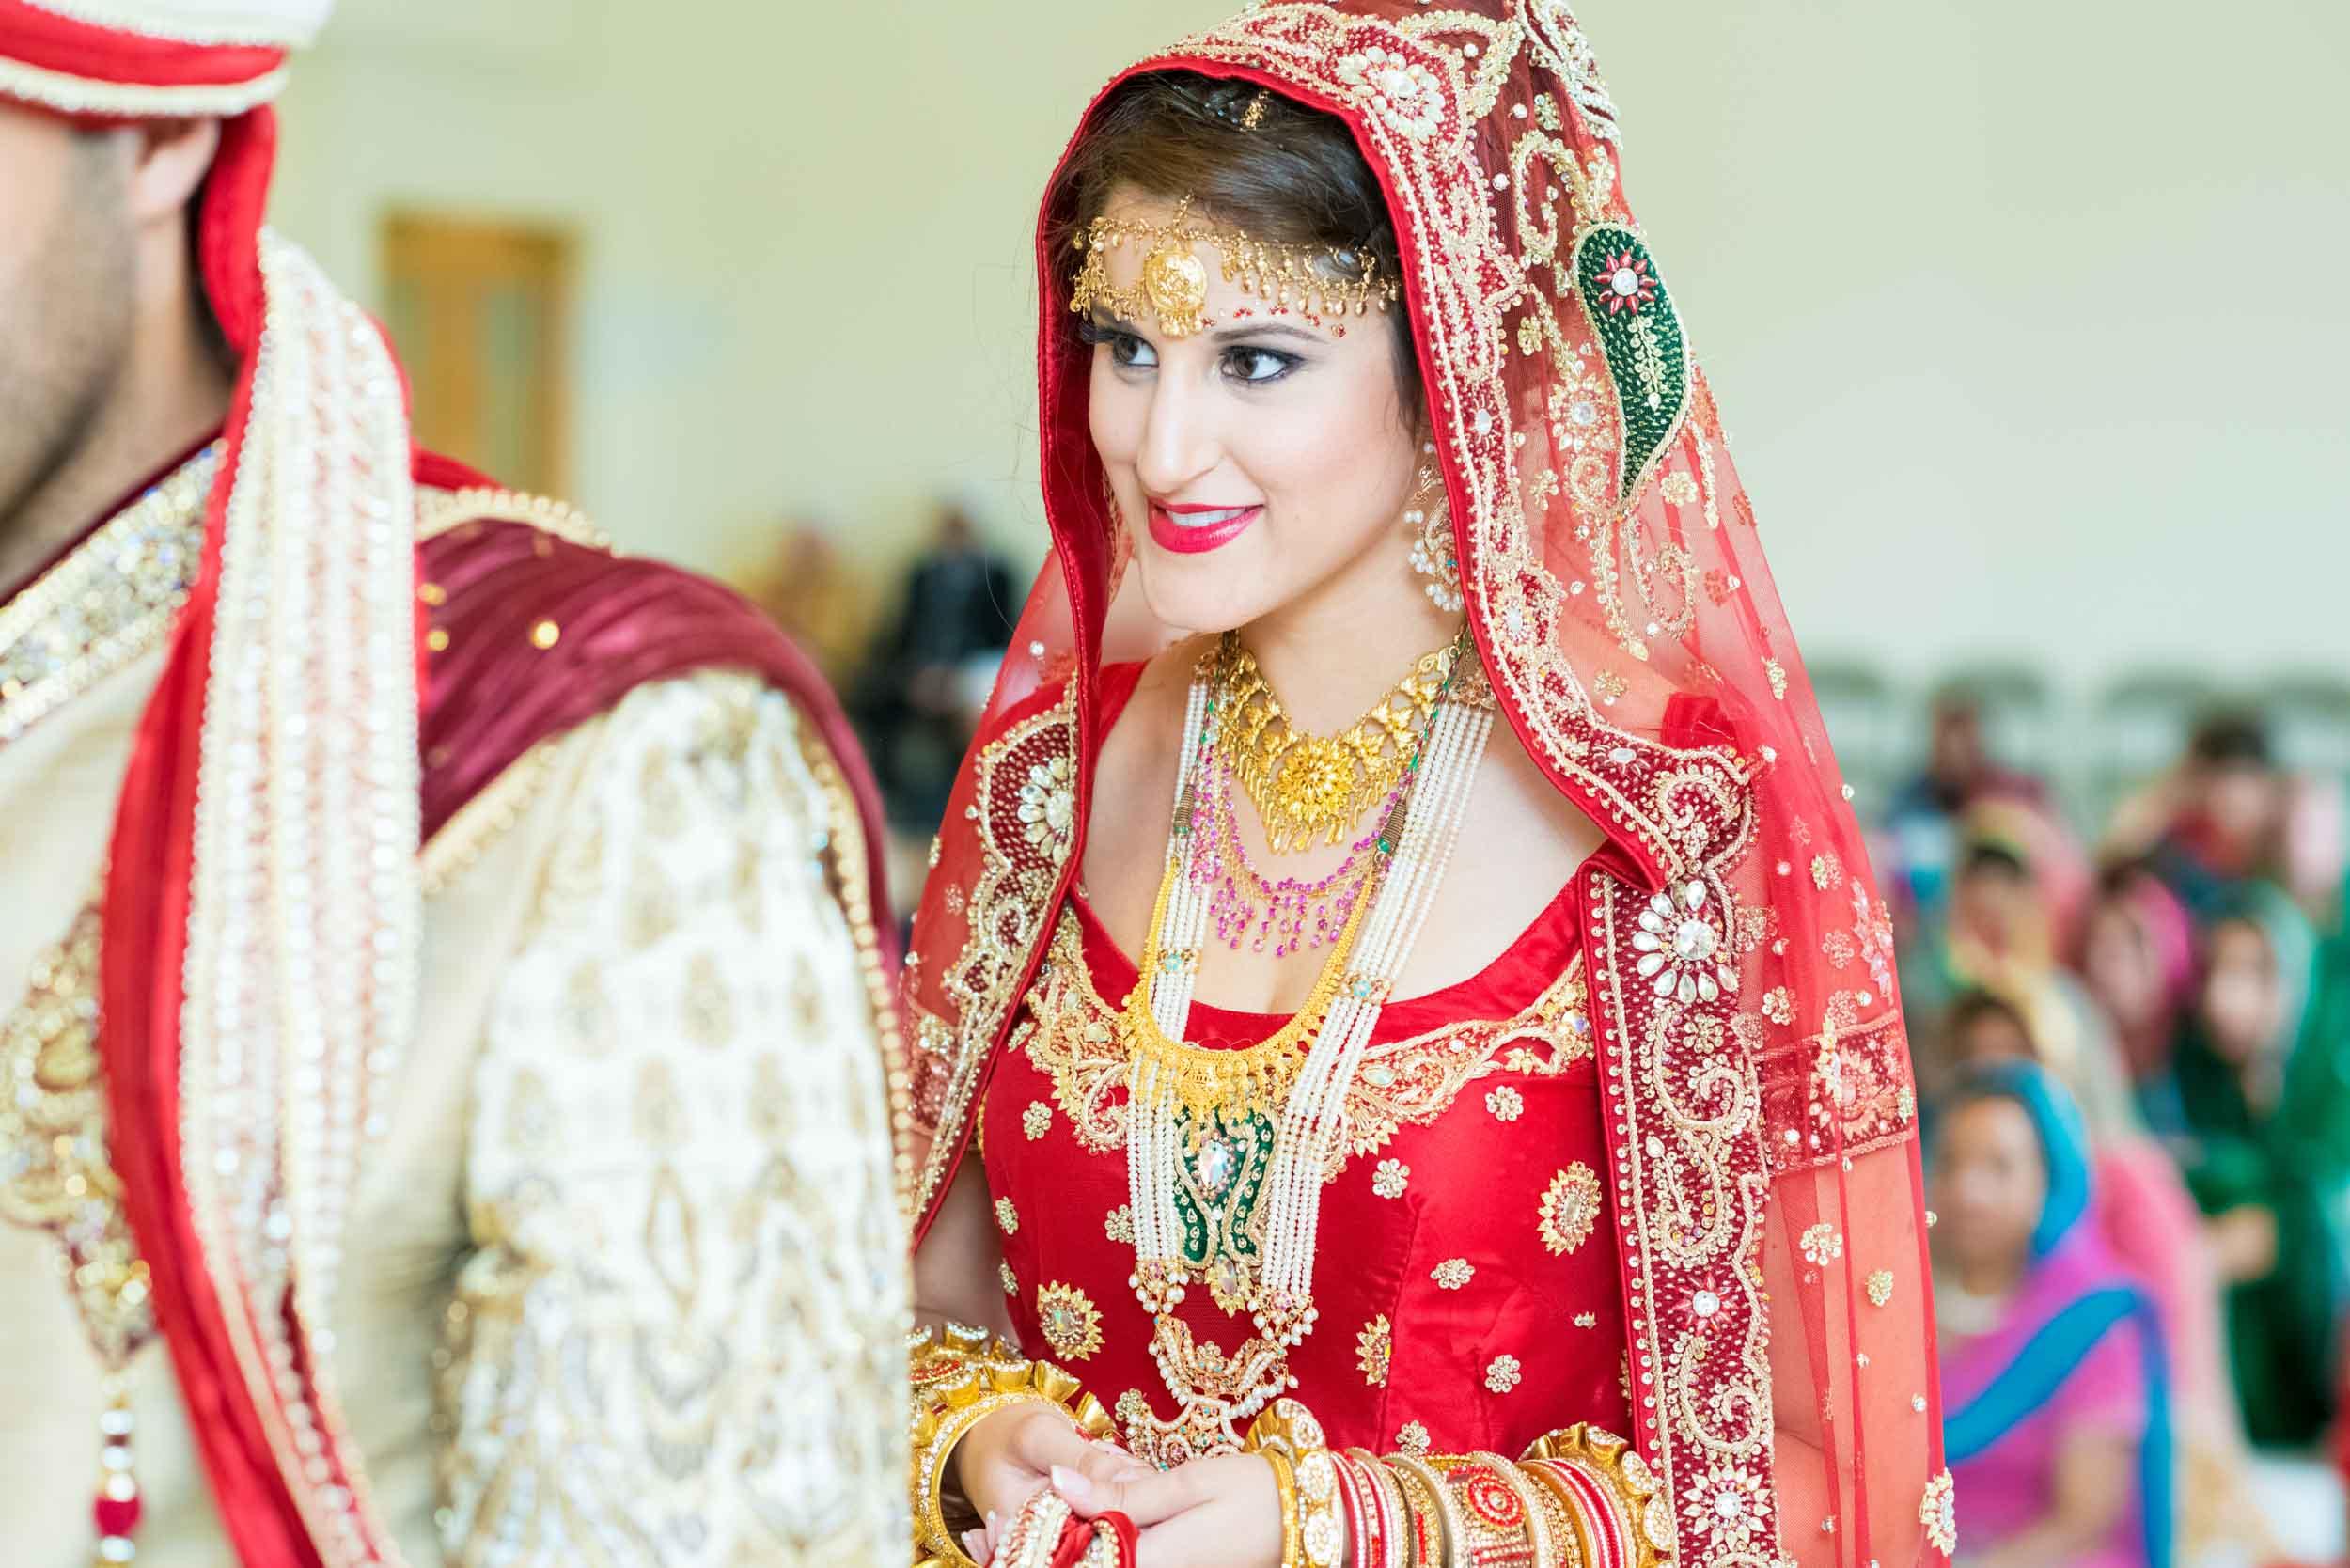 dc+metro+wedding+photographer+vadym+guliuk+photography+wedding+ceremony-2037.jpg